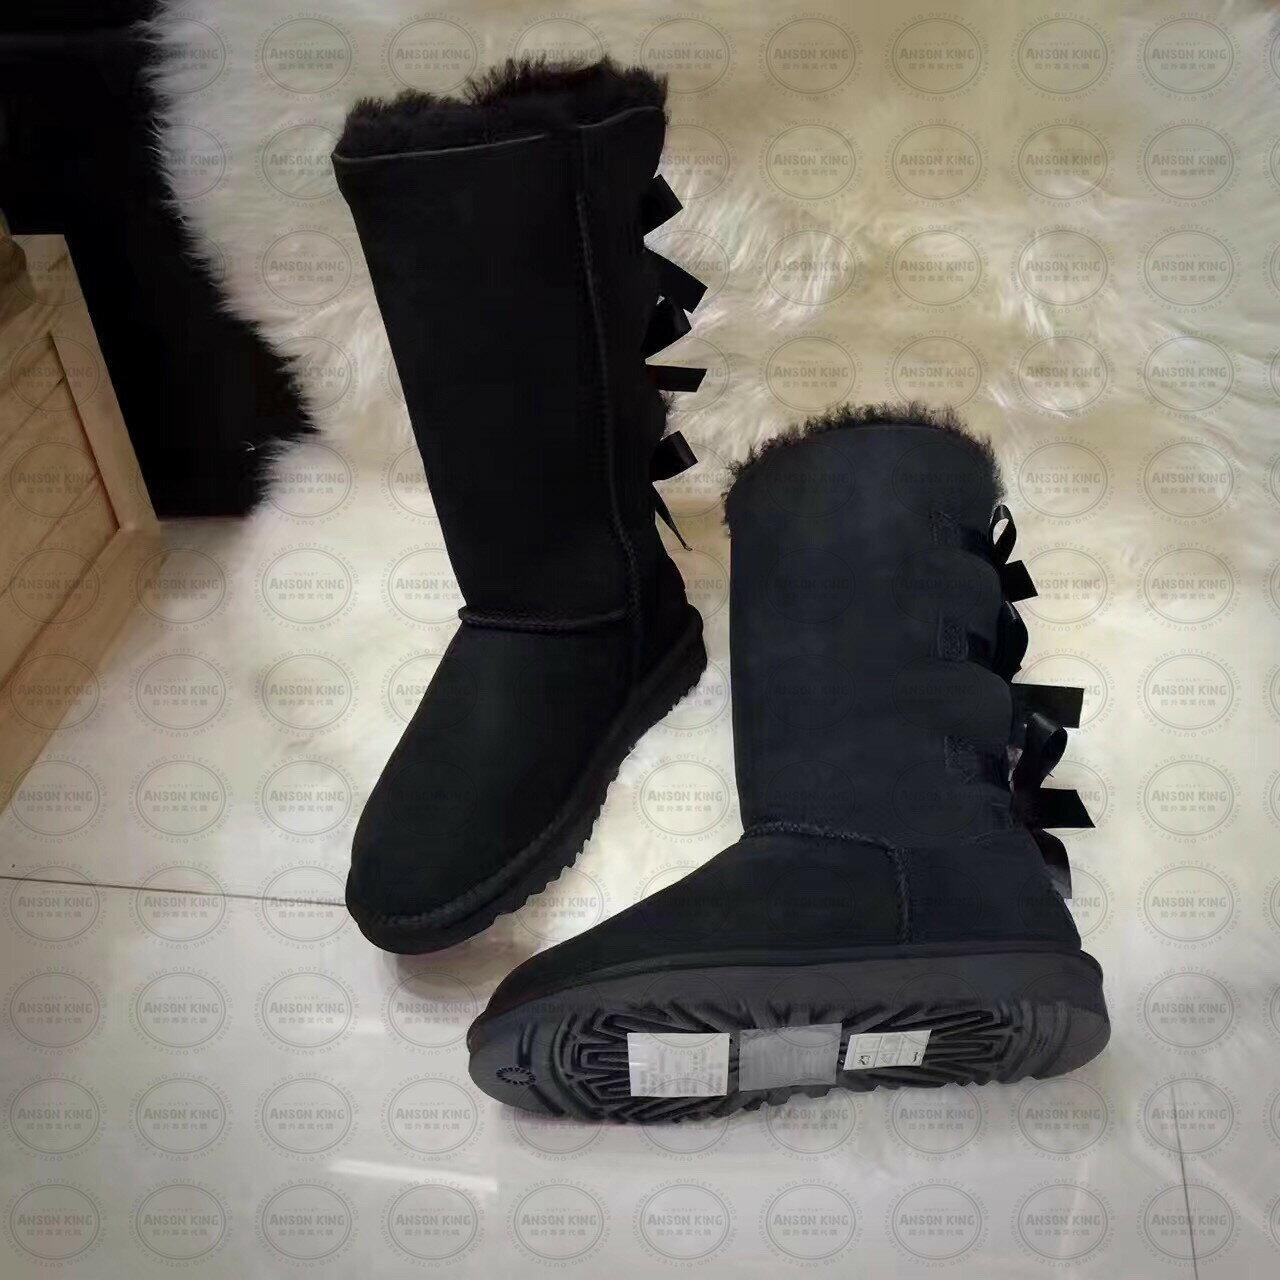 OUTLET正品代購 澳洲 UGG 一體女式絲帶蝴蝶結 保暖 真皮羊皮毛 雪靴 短靴 黑色 1